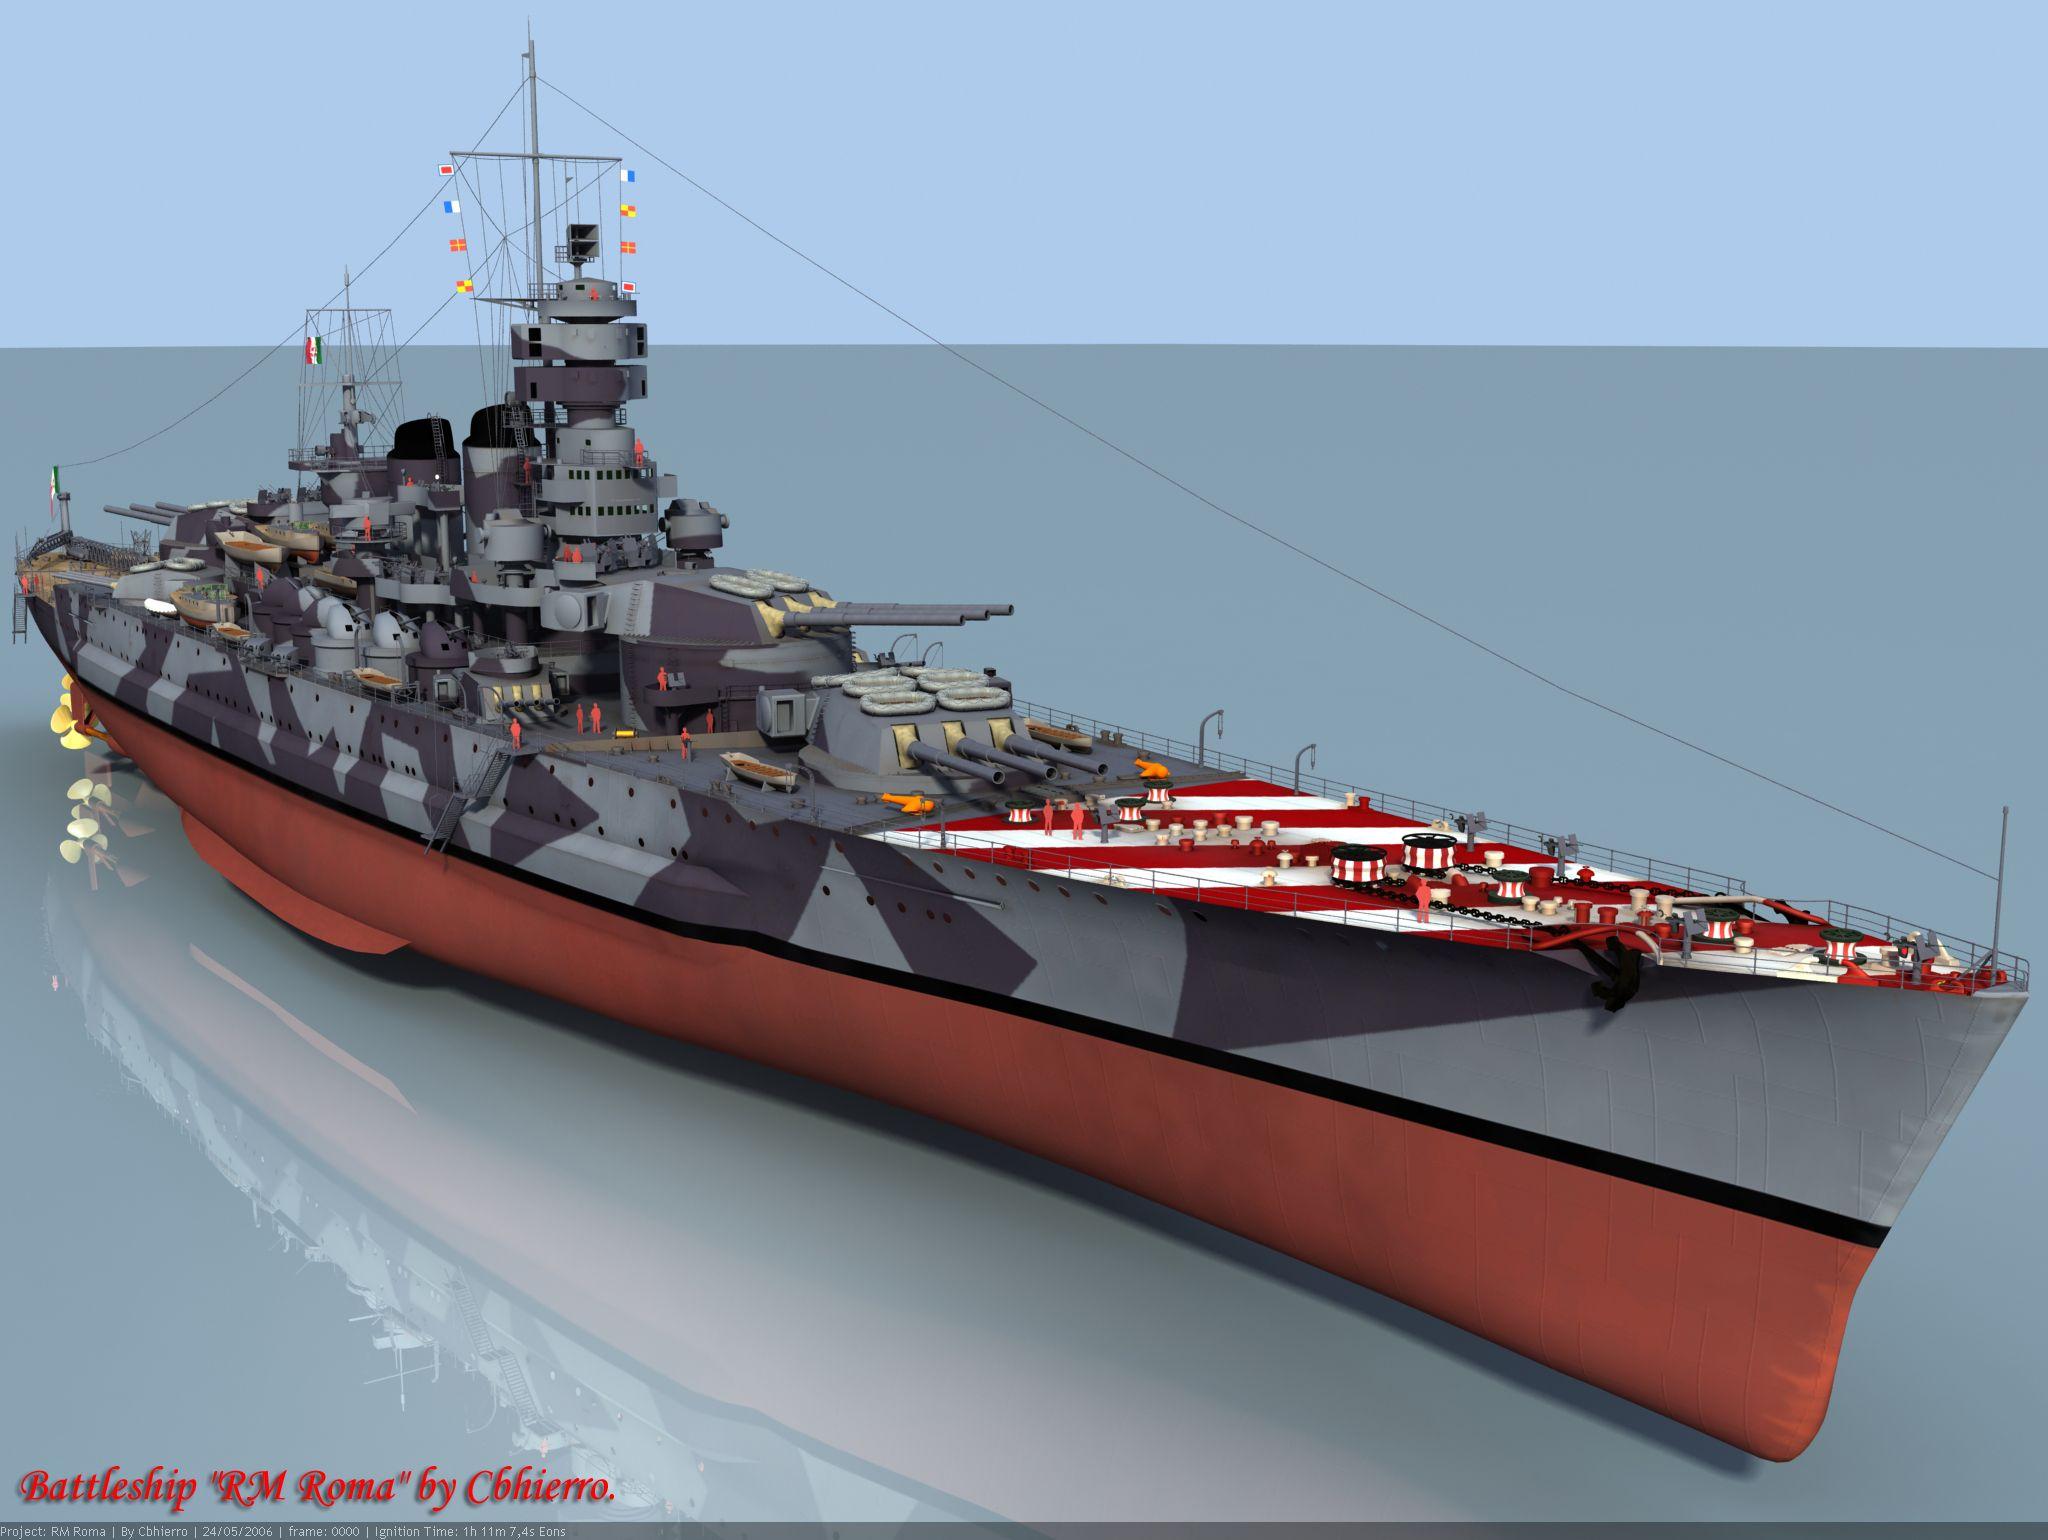 Wwii italy navy battleship roma 1943 plastic model images list - Cg Drawing Of Italian Battleship Roma